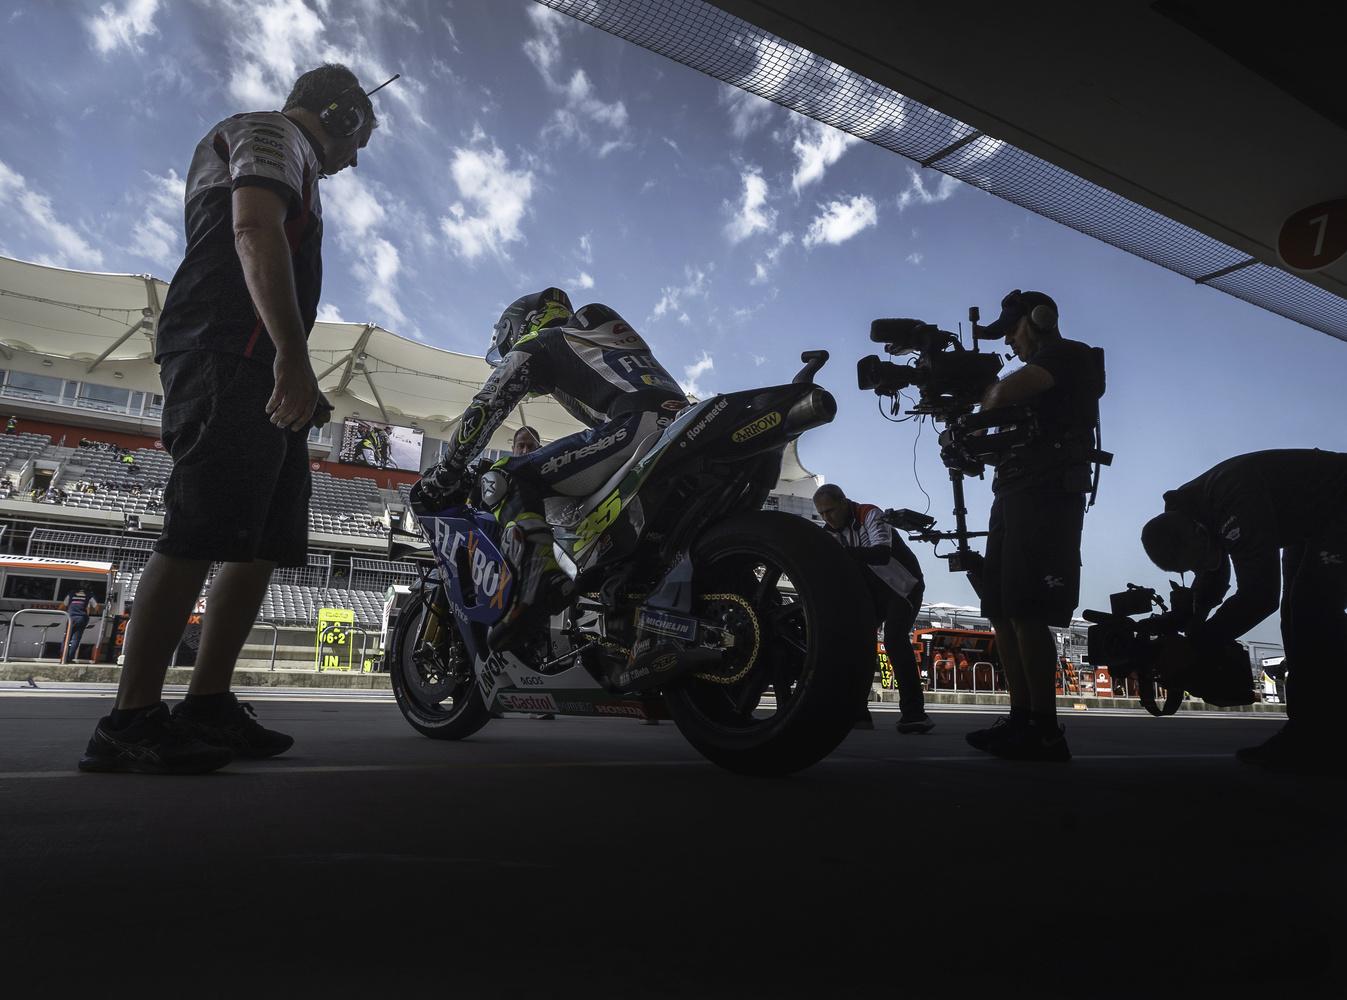 Cal Crutchlow HRC Honda MotoGP 2019 by Zachary Bolena